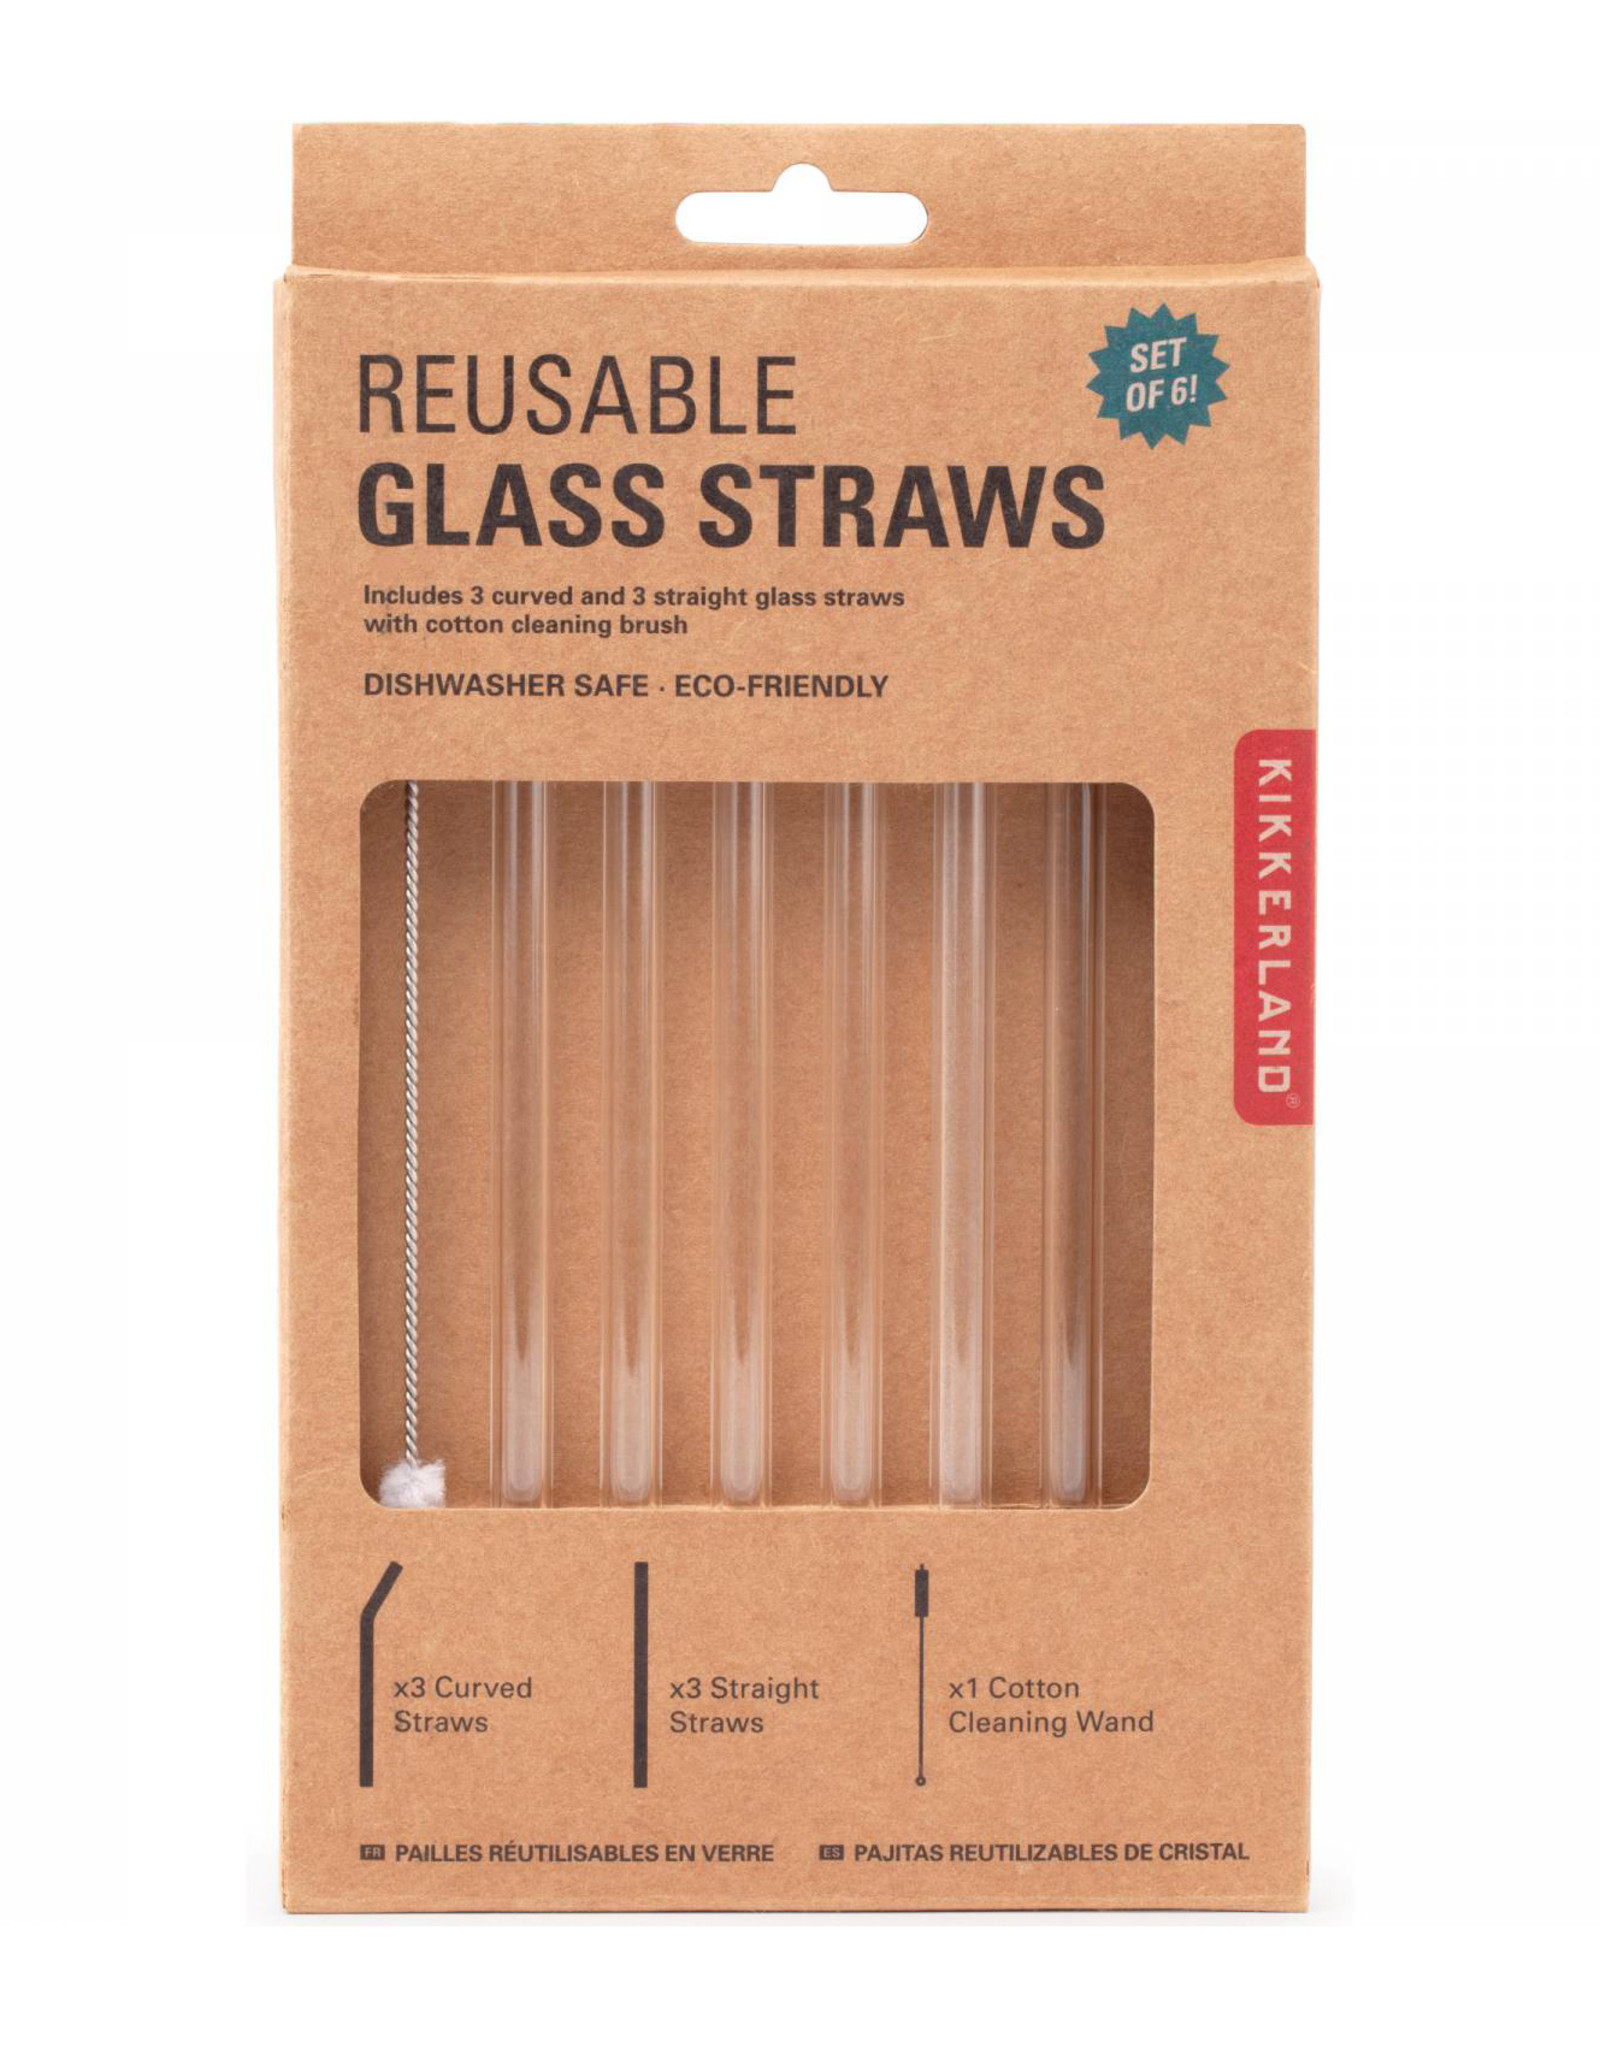 Kikkerland KL-Clear Glass Straws S/6